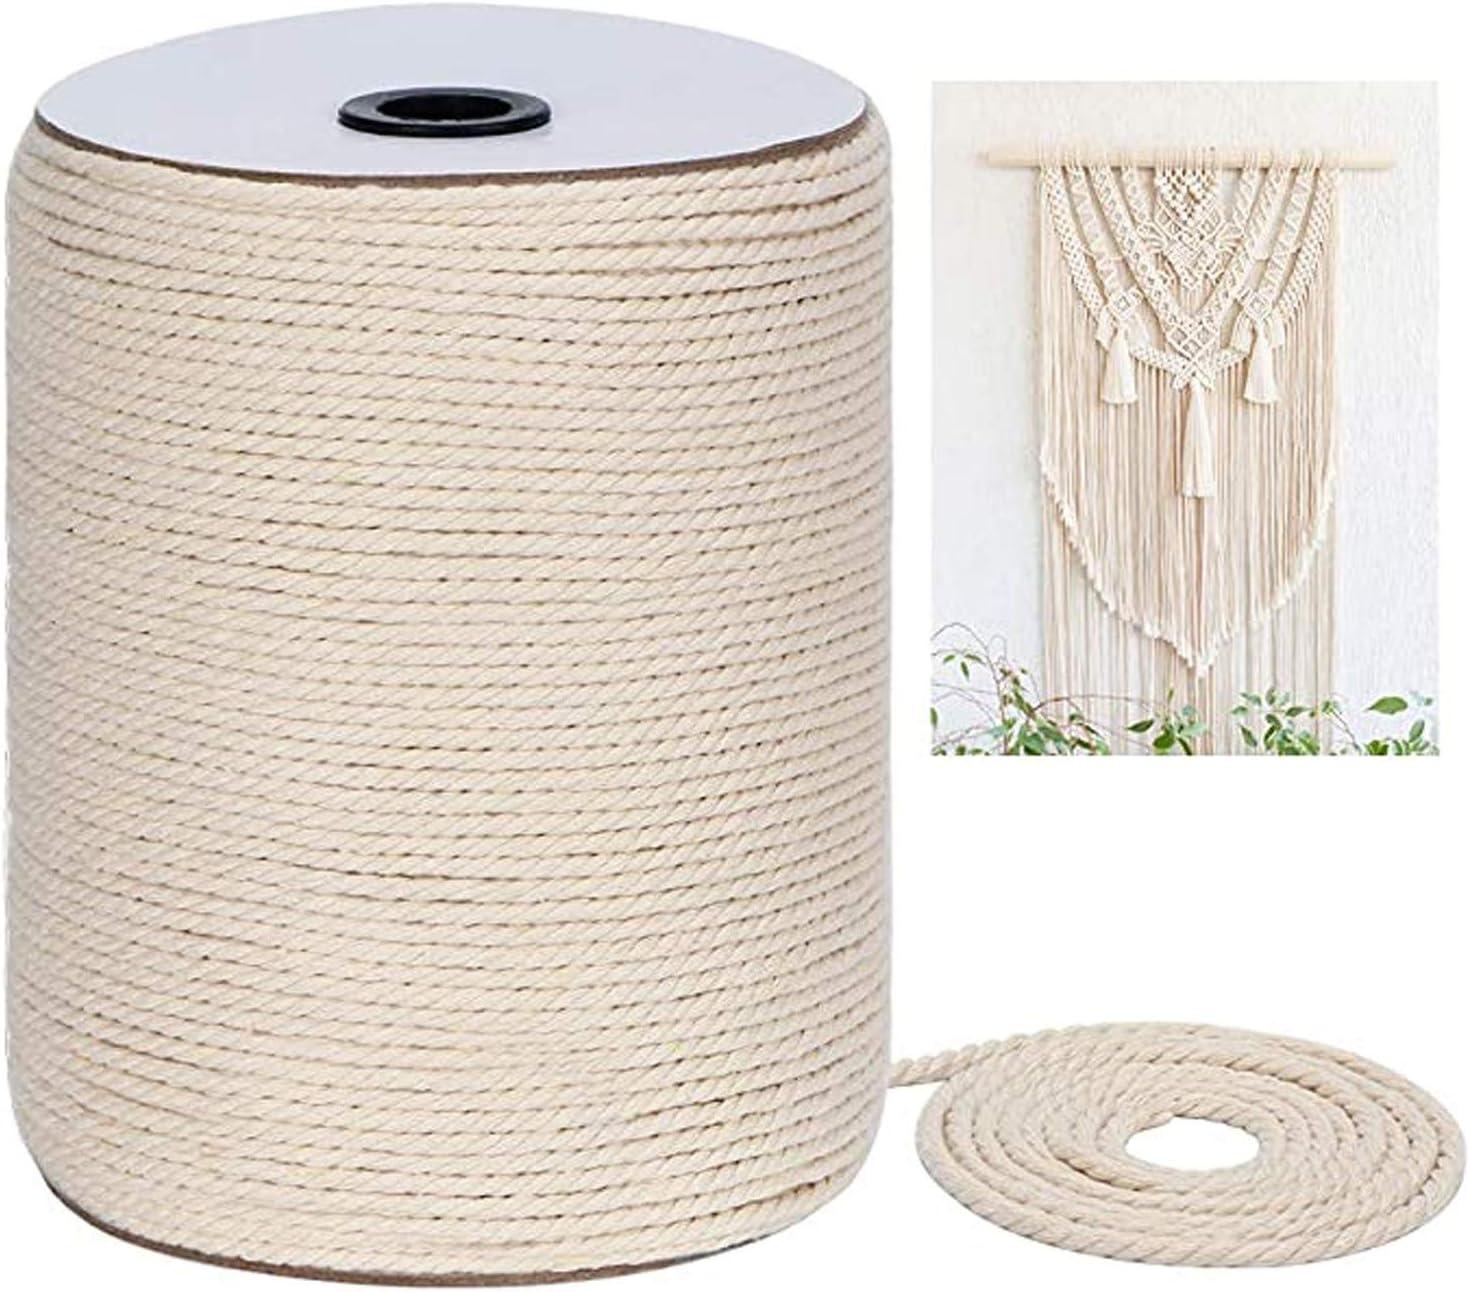 3mm x 300m Cotton Industry No. 1 Cord Macramé String Natural Rope Washington Mall Twine